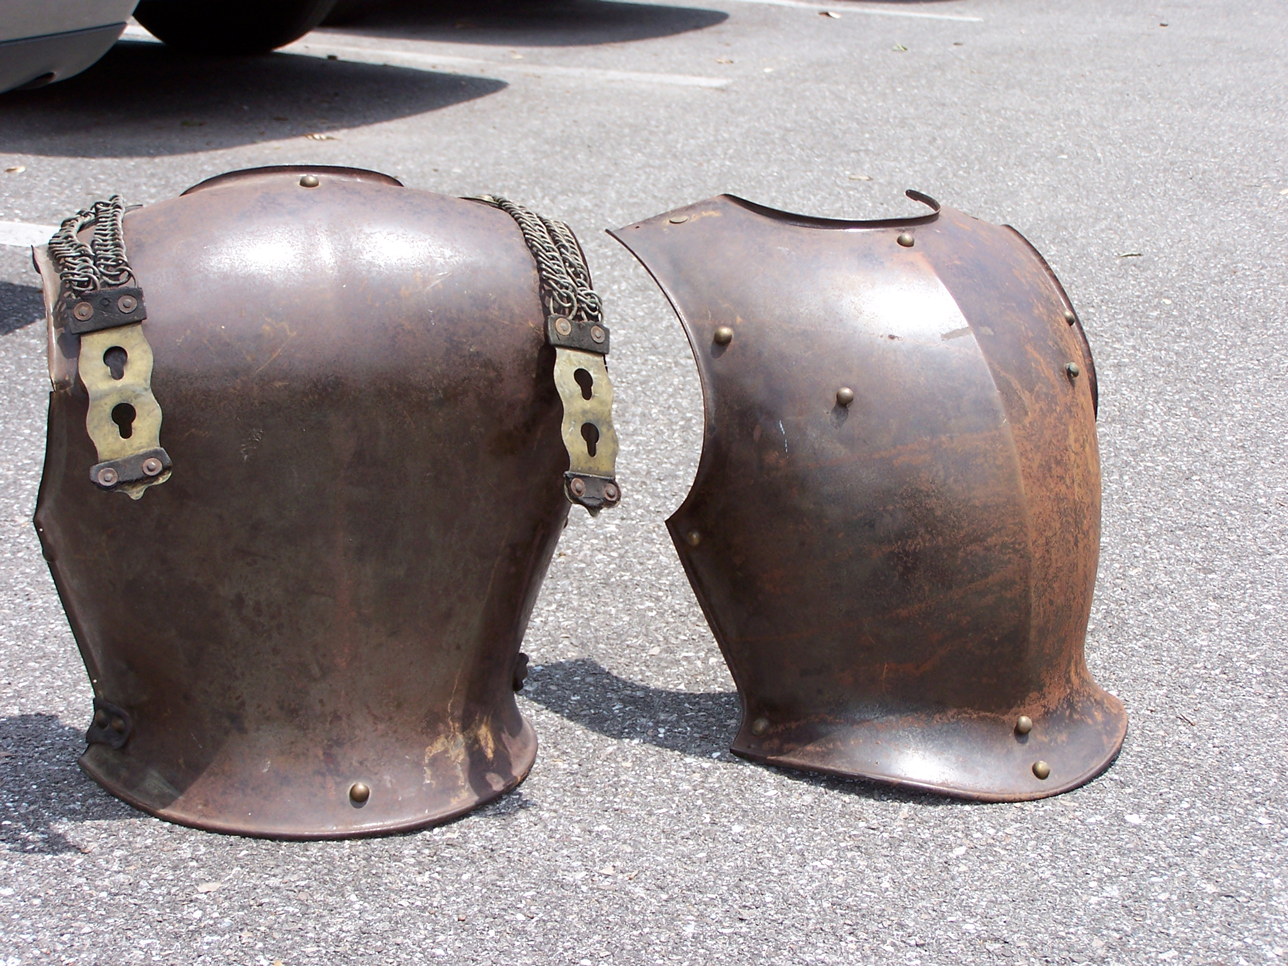 Cuirass Antique Armor - Cuiras...